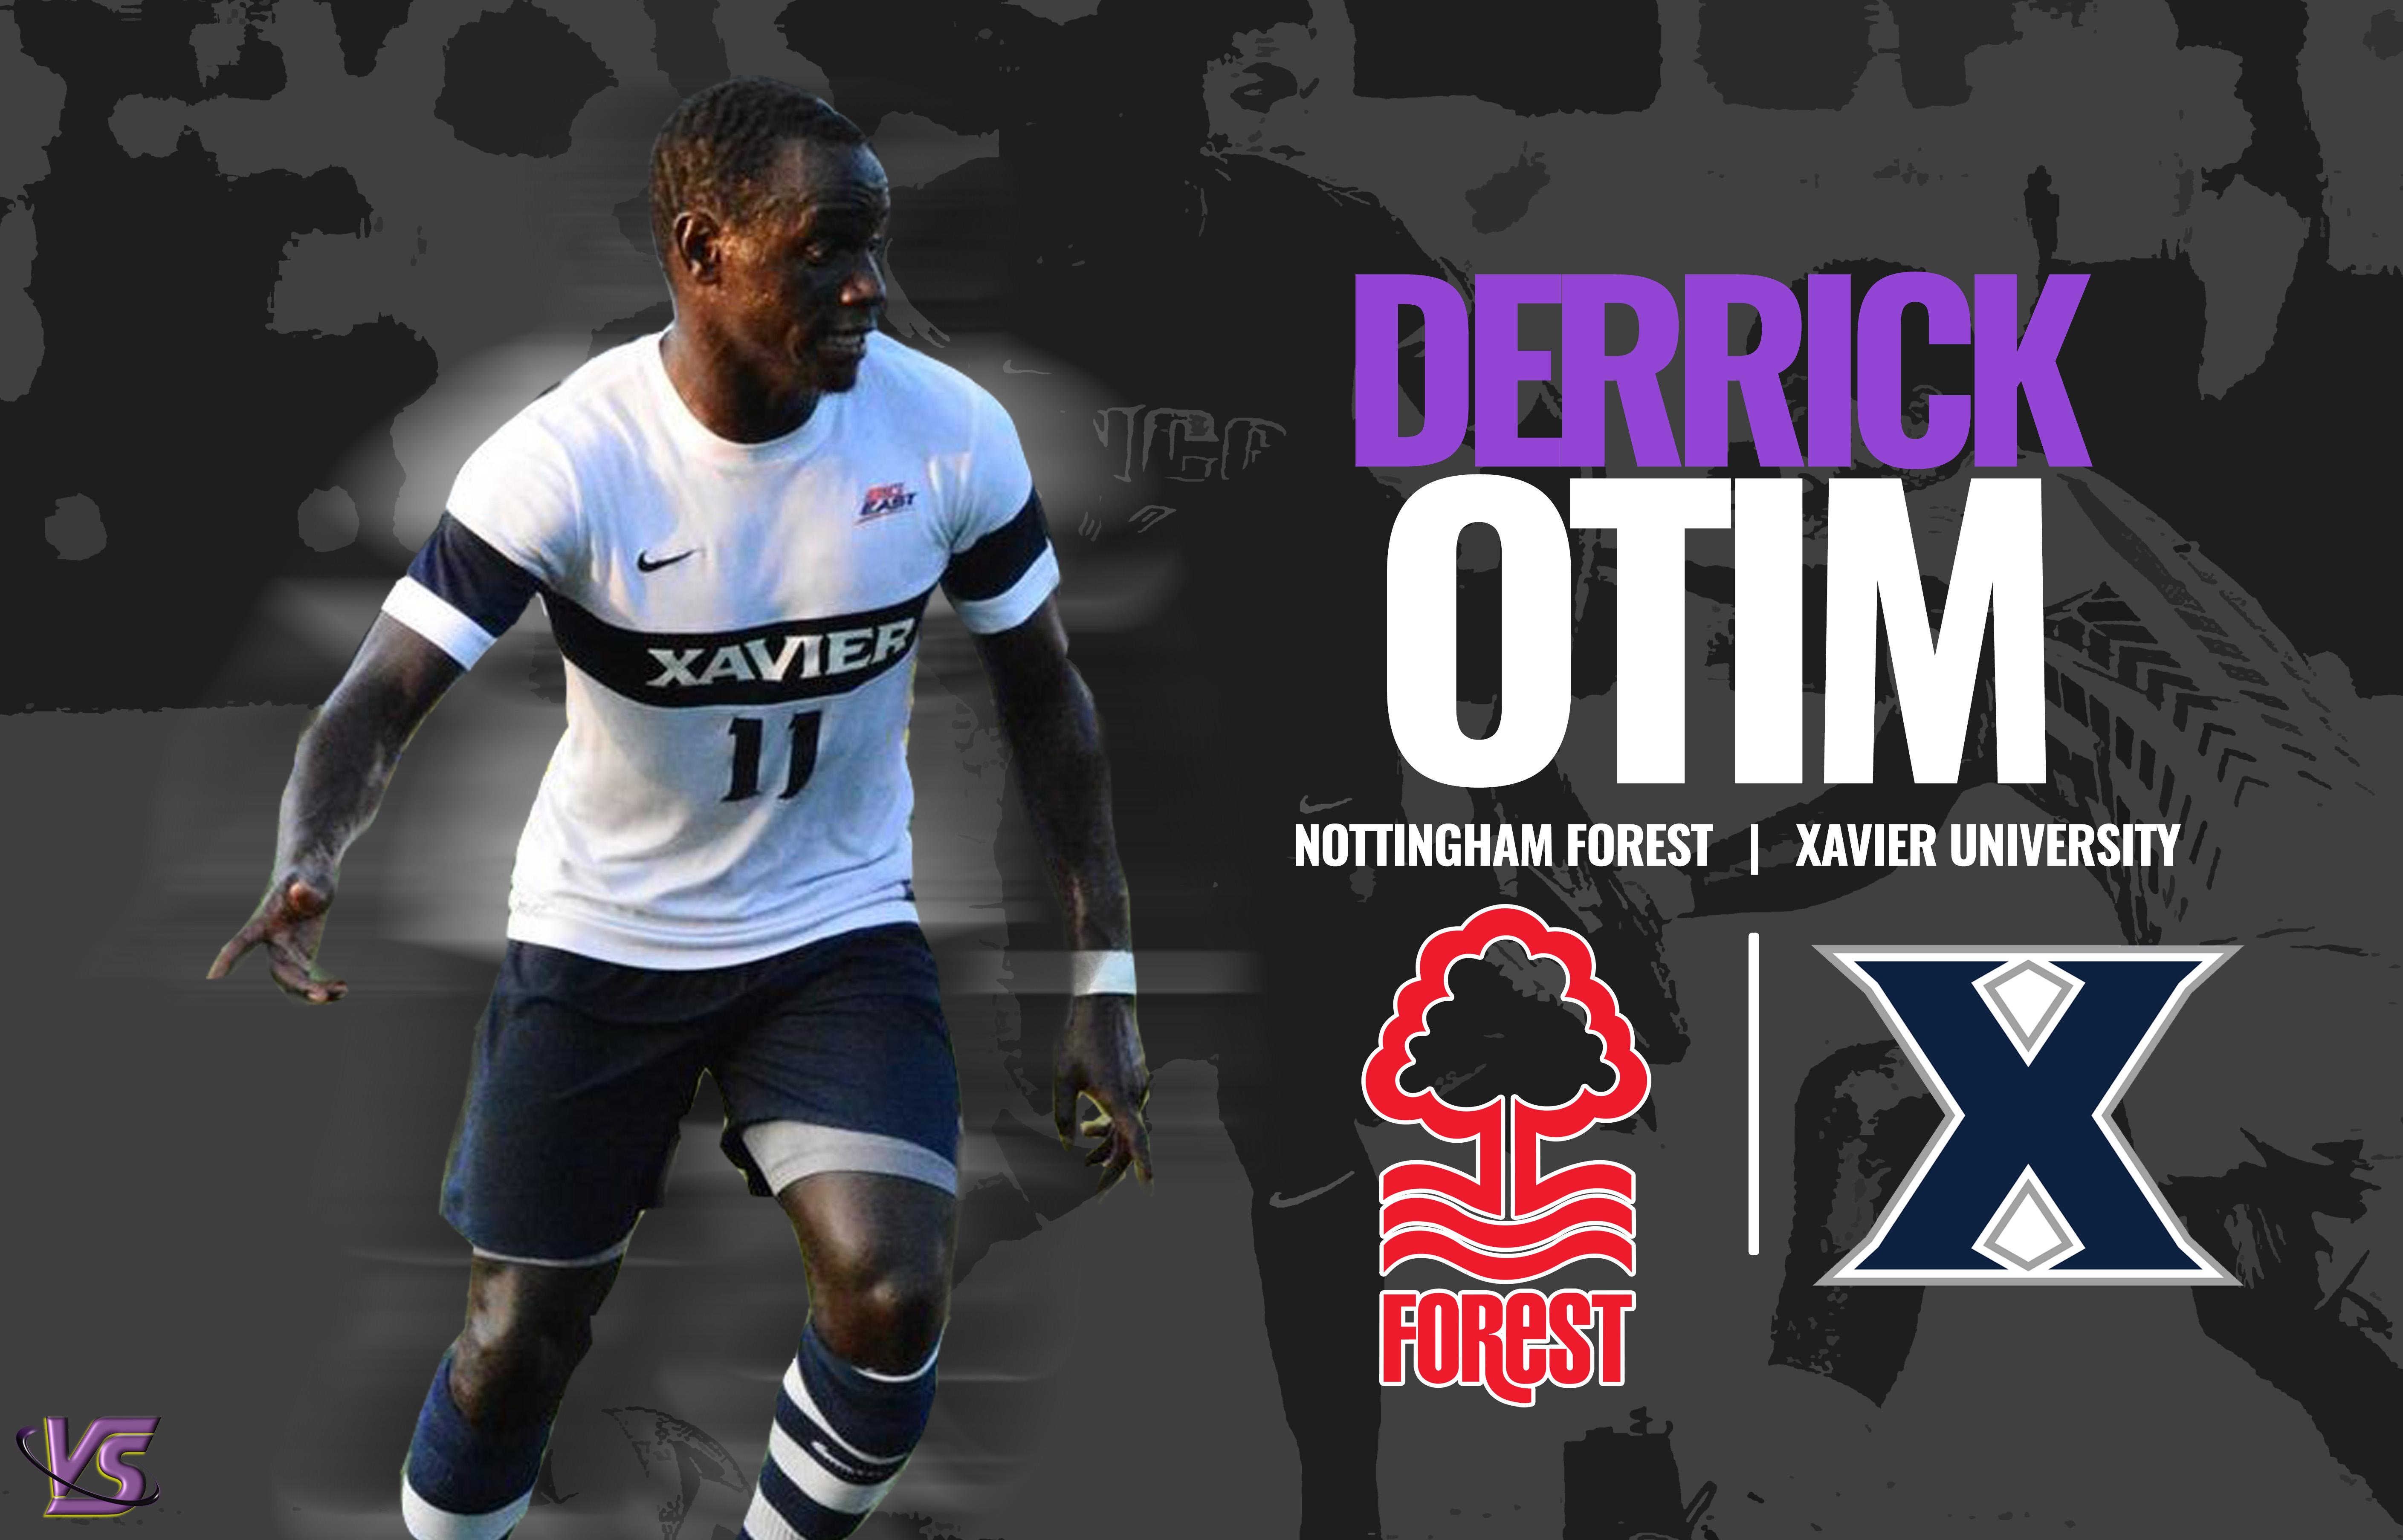 Derrick Otim 2016